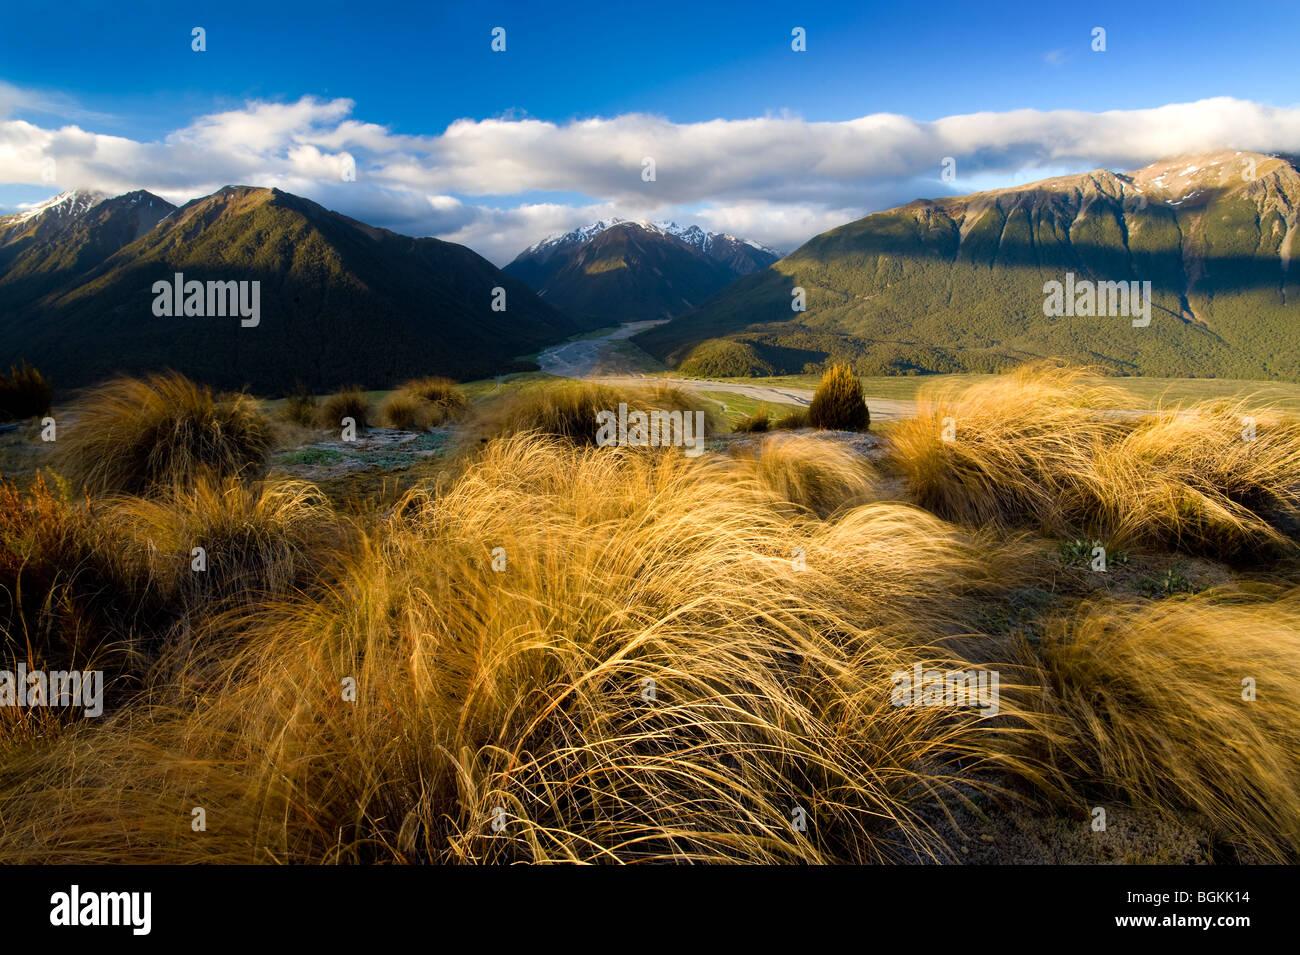 Arthur's Pass National Park, South Island, New Zealand - Stock Image